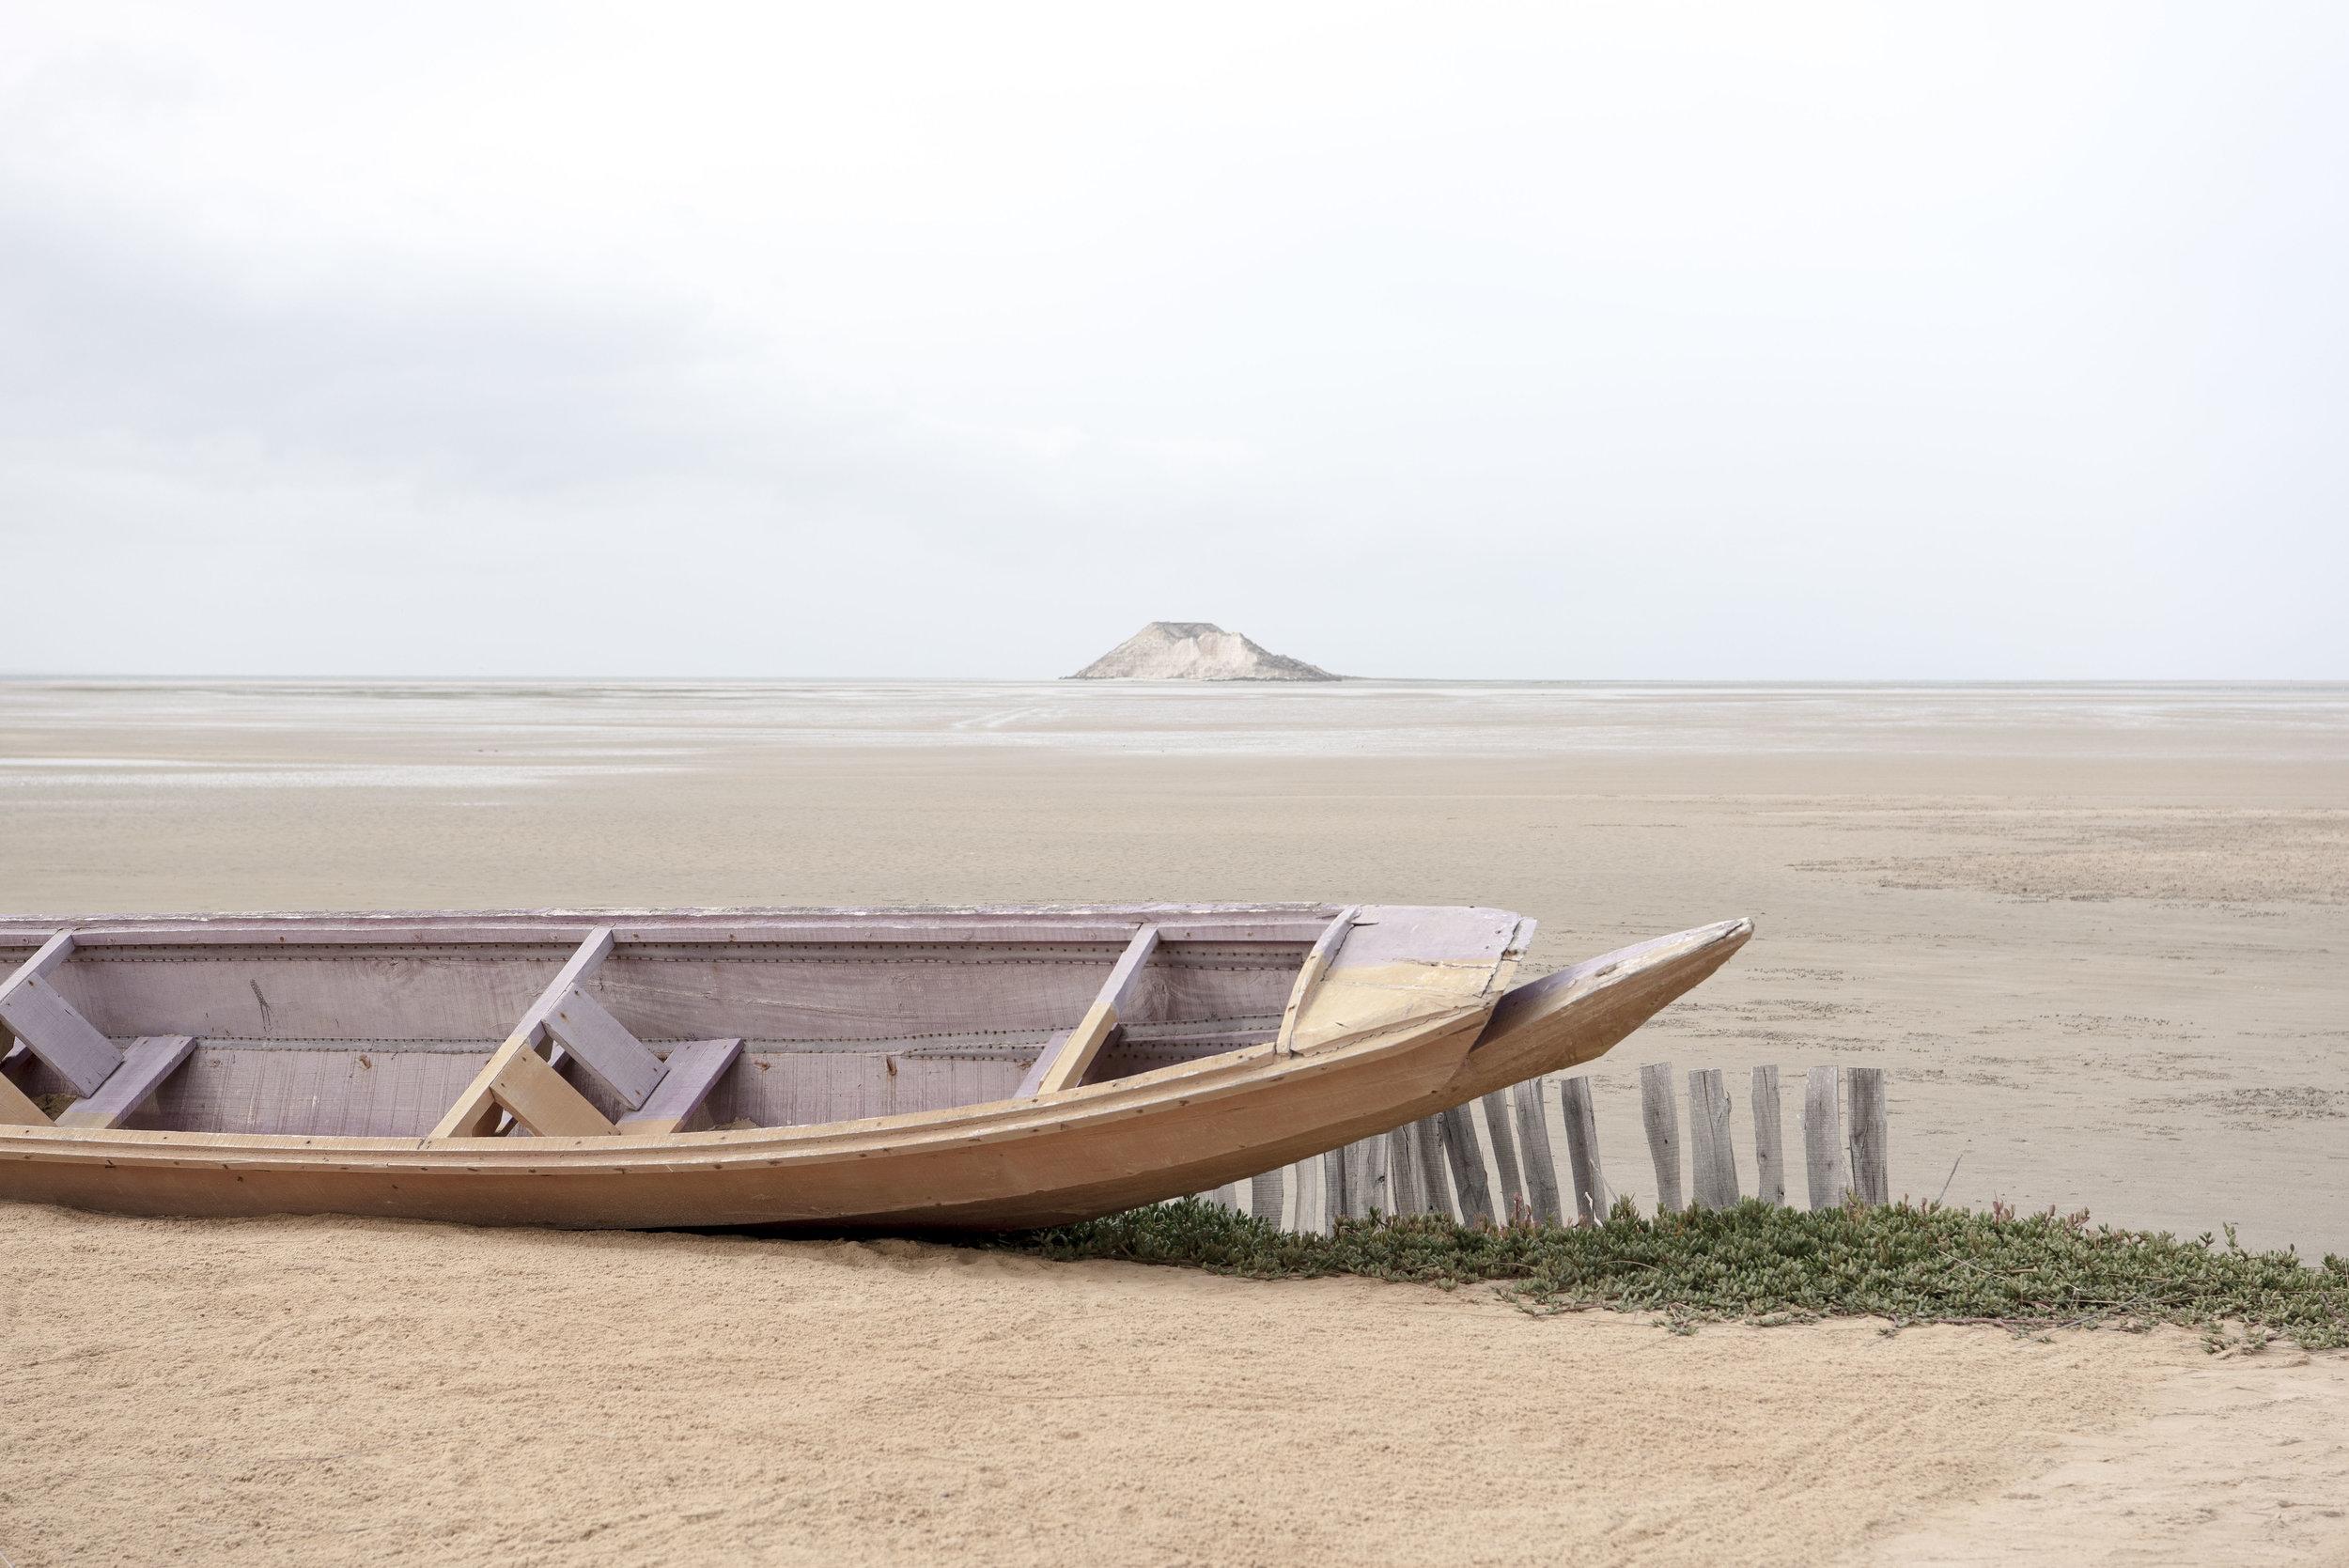 Olivia Thébaut - Dakhla, Morocco.